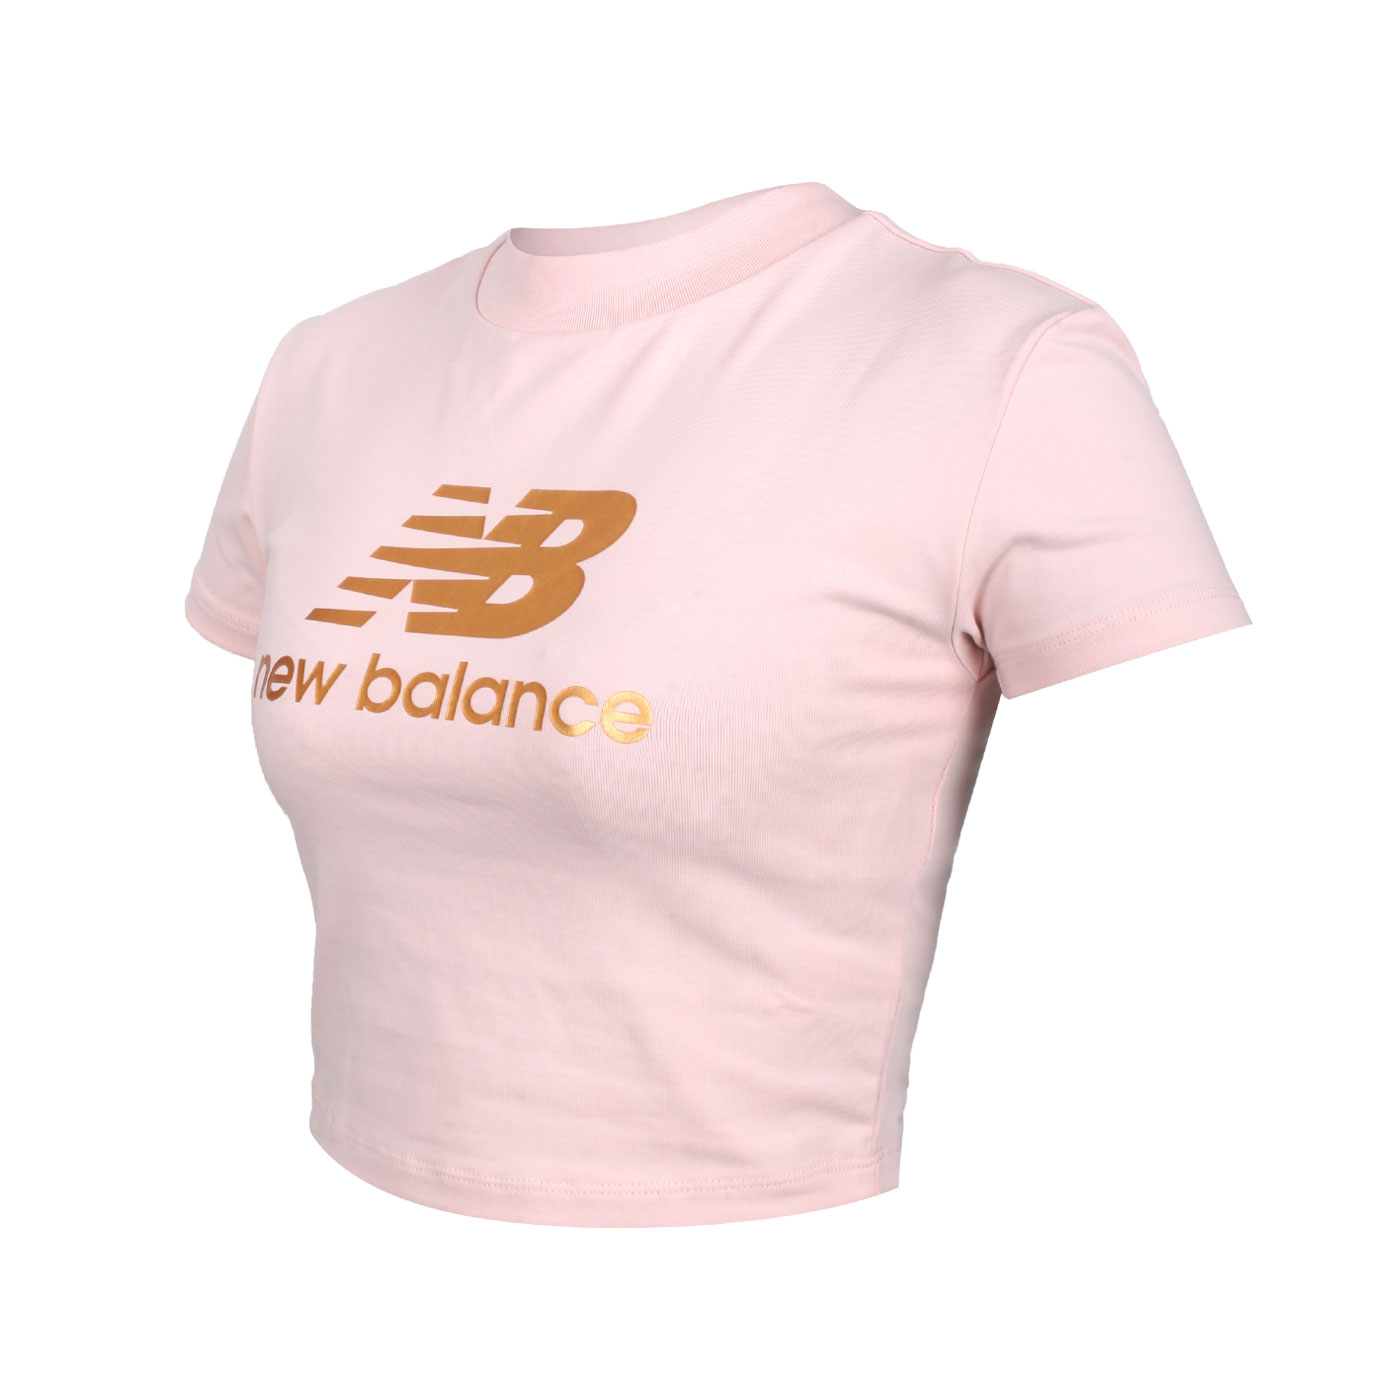 NEW BALANCE 女款短版短袖T恤 WT13503OPK